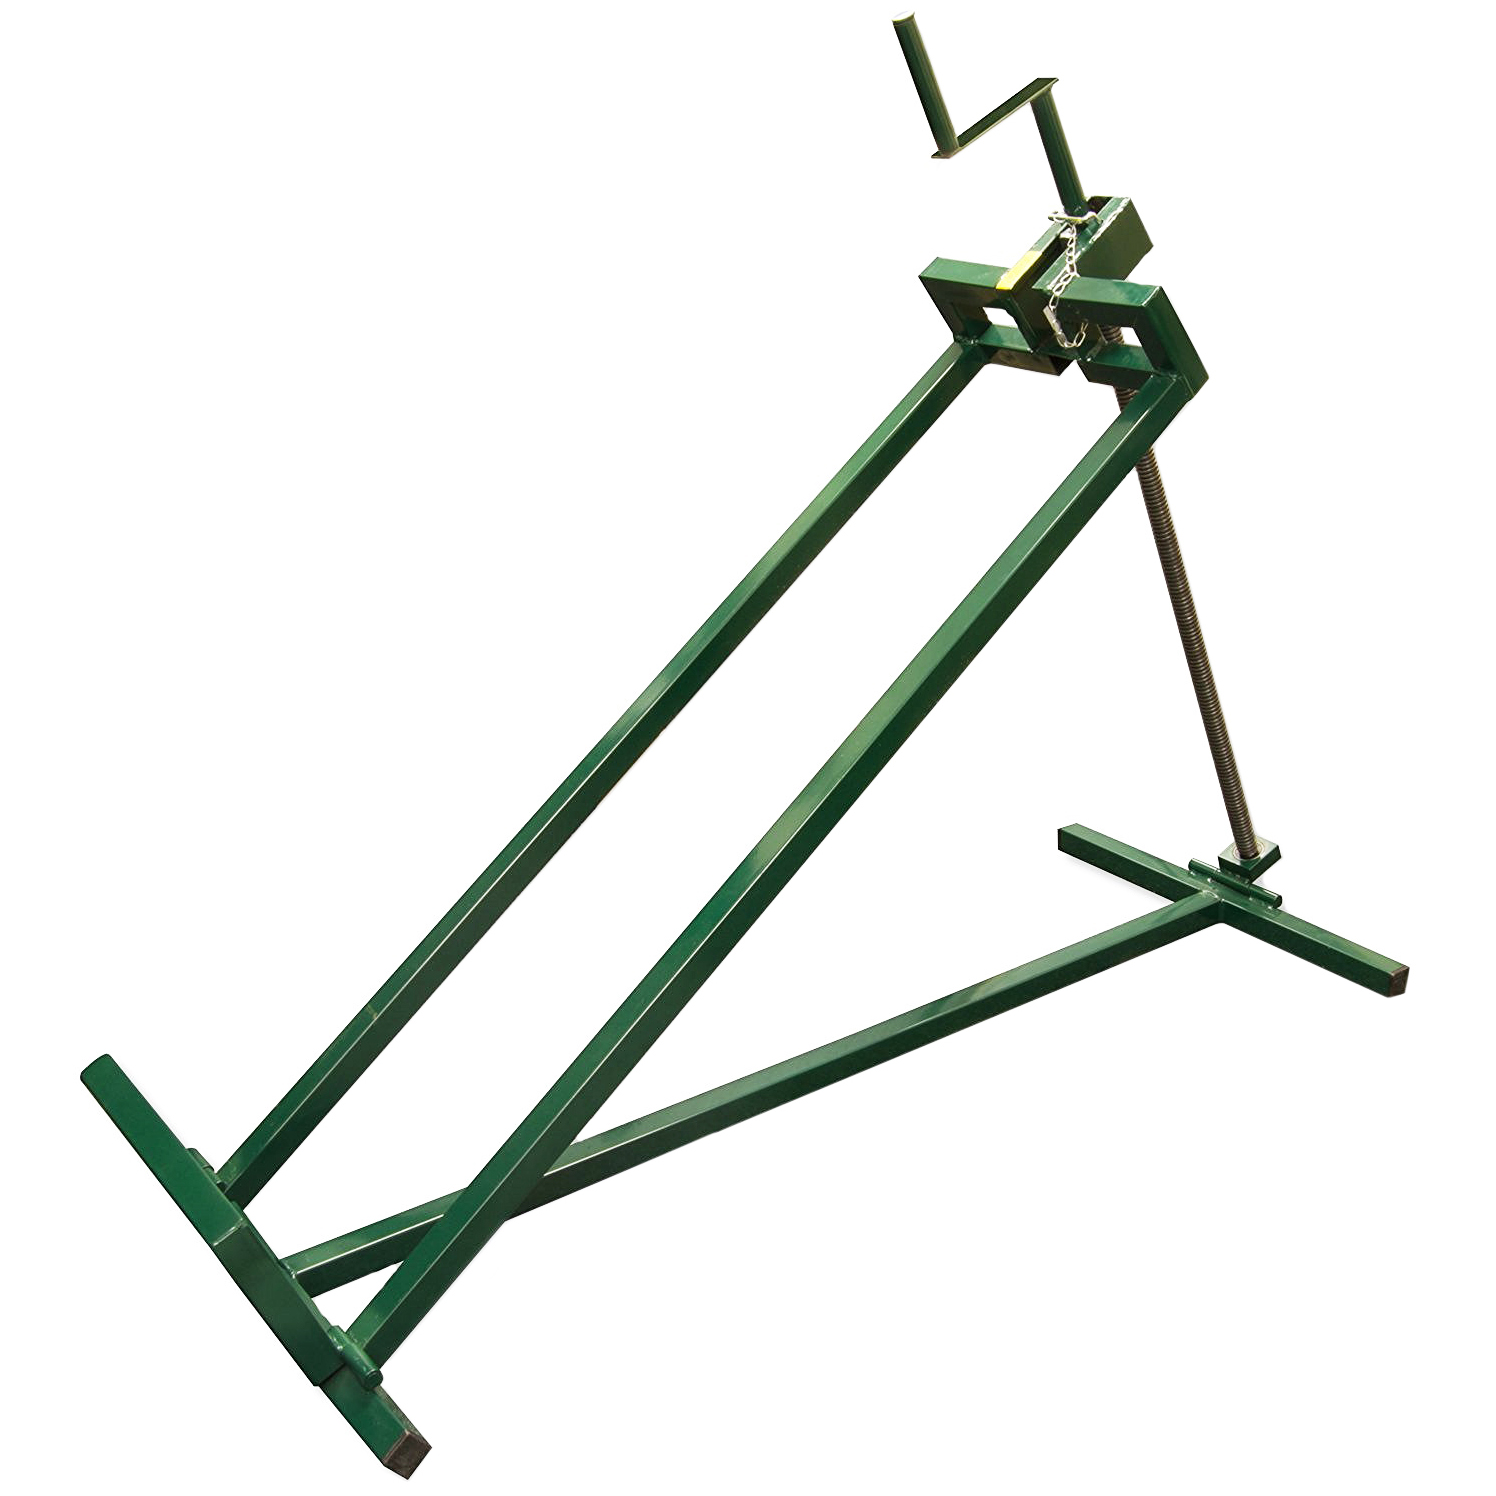 Lawn Tractor Lift : Sit on garden lawn mower jack £ oypla stocking